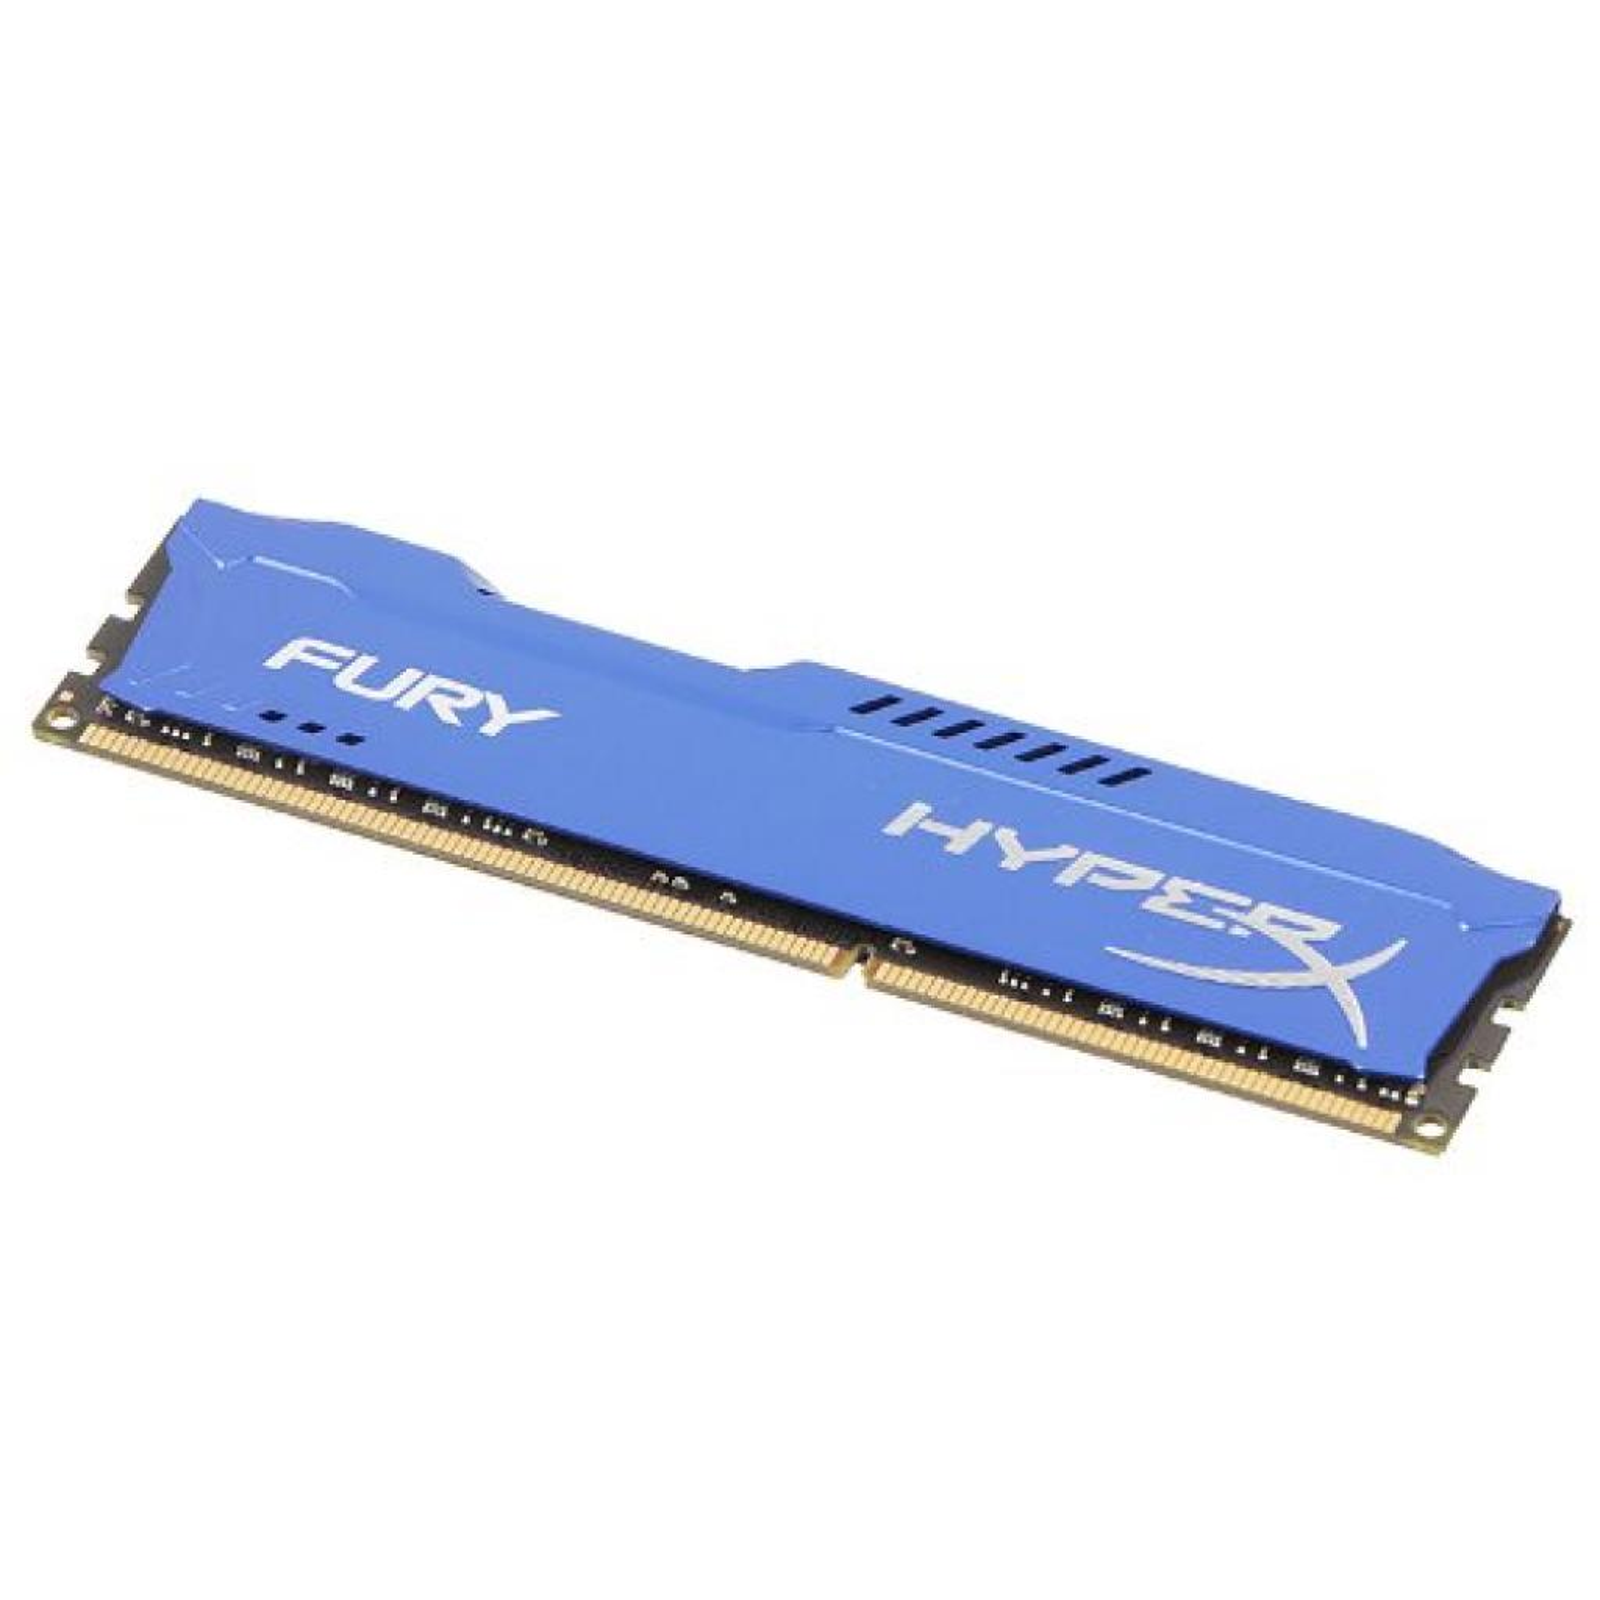 Модуль памяти для компьютера DDR3 8Gb 1866 MHz HyperX Fury Blu Kingston (HX318C10F/8) изображение 4